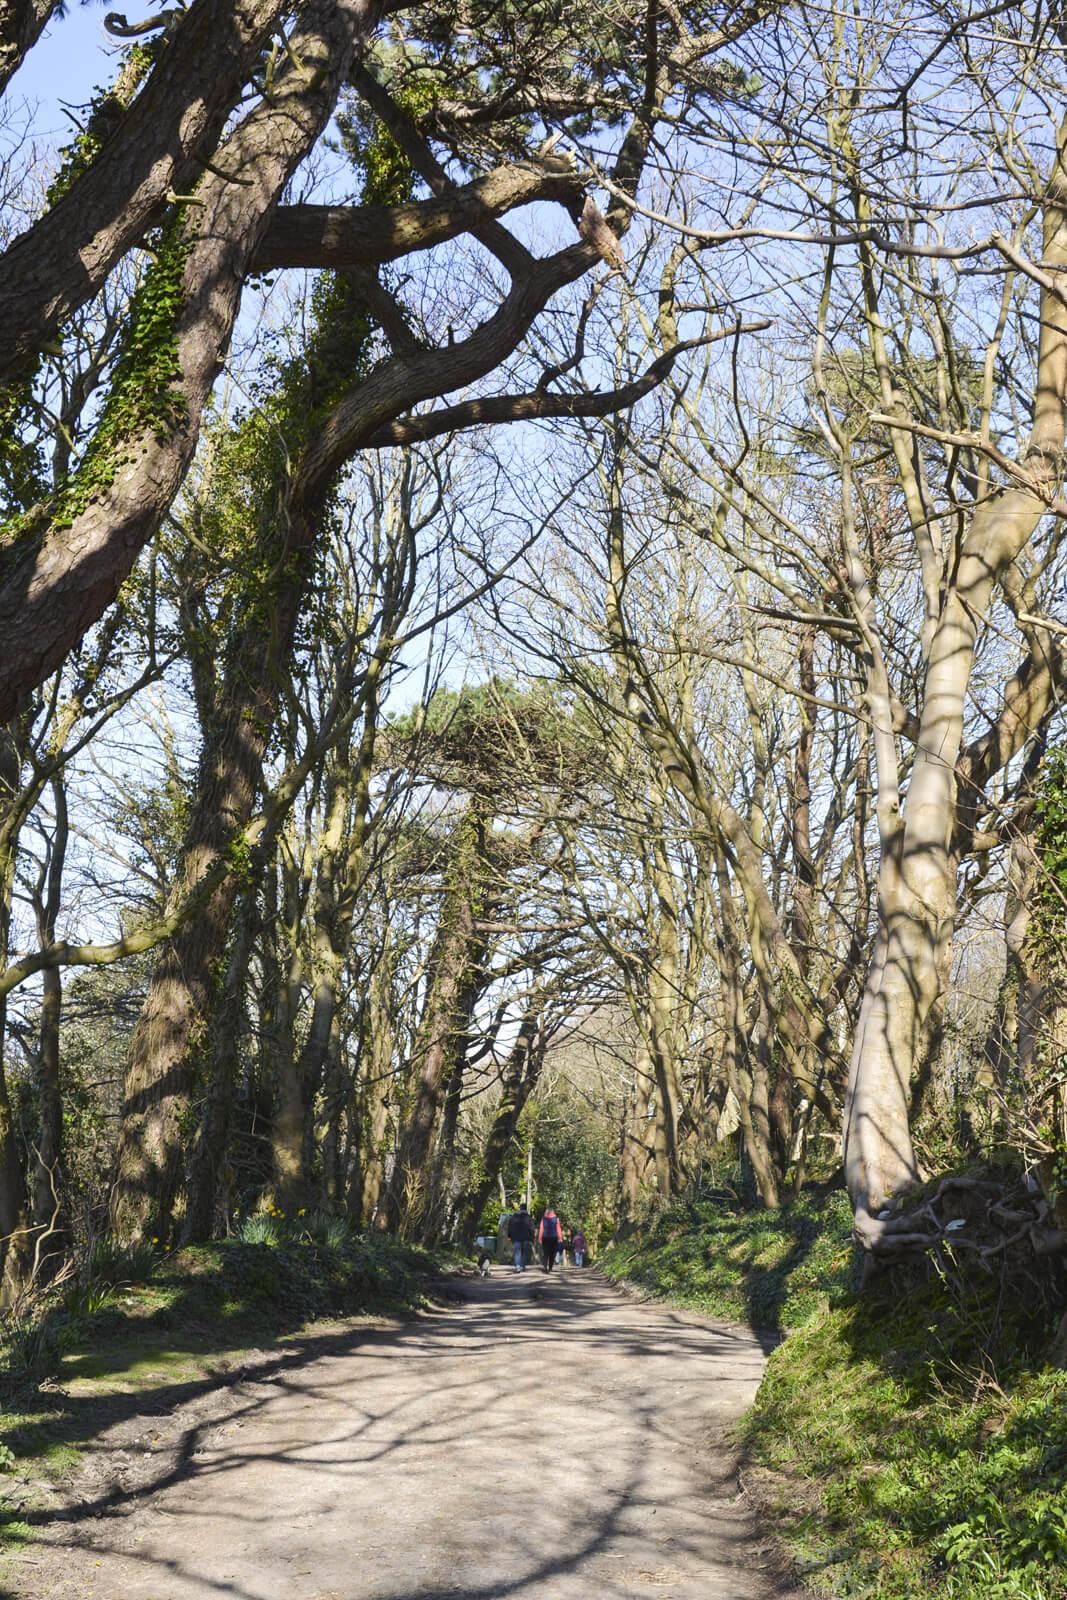 20150322 DSC_0617 Whitwell Ashknowle Lane Spring Family Walking